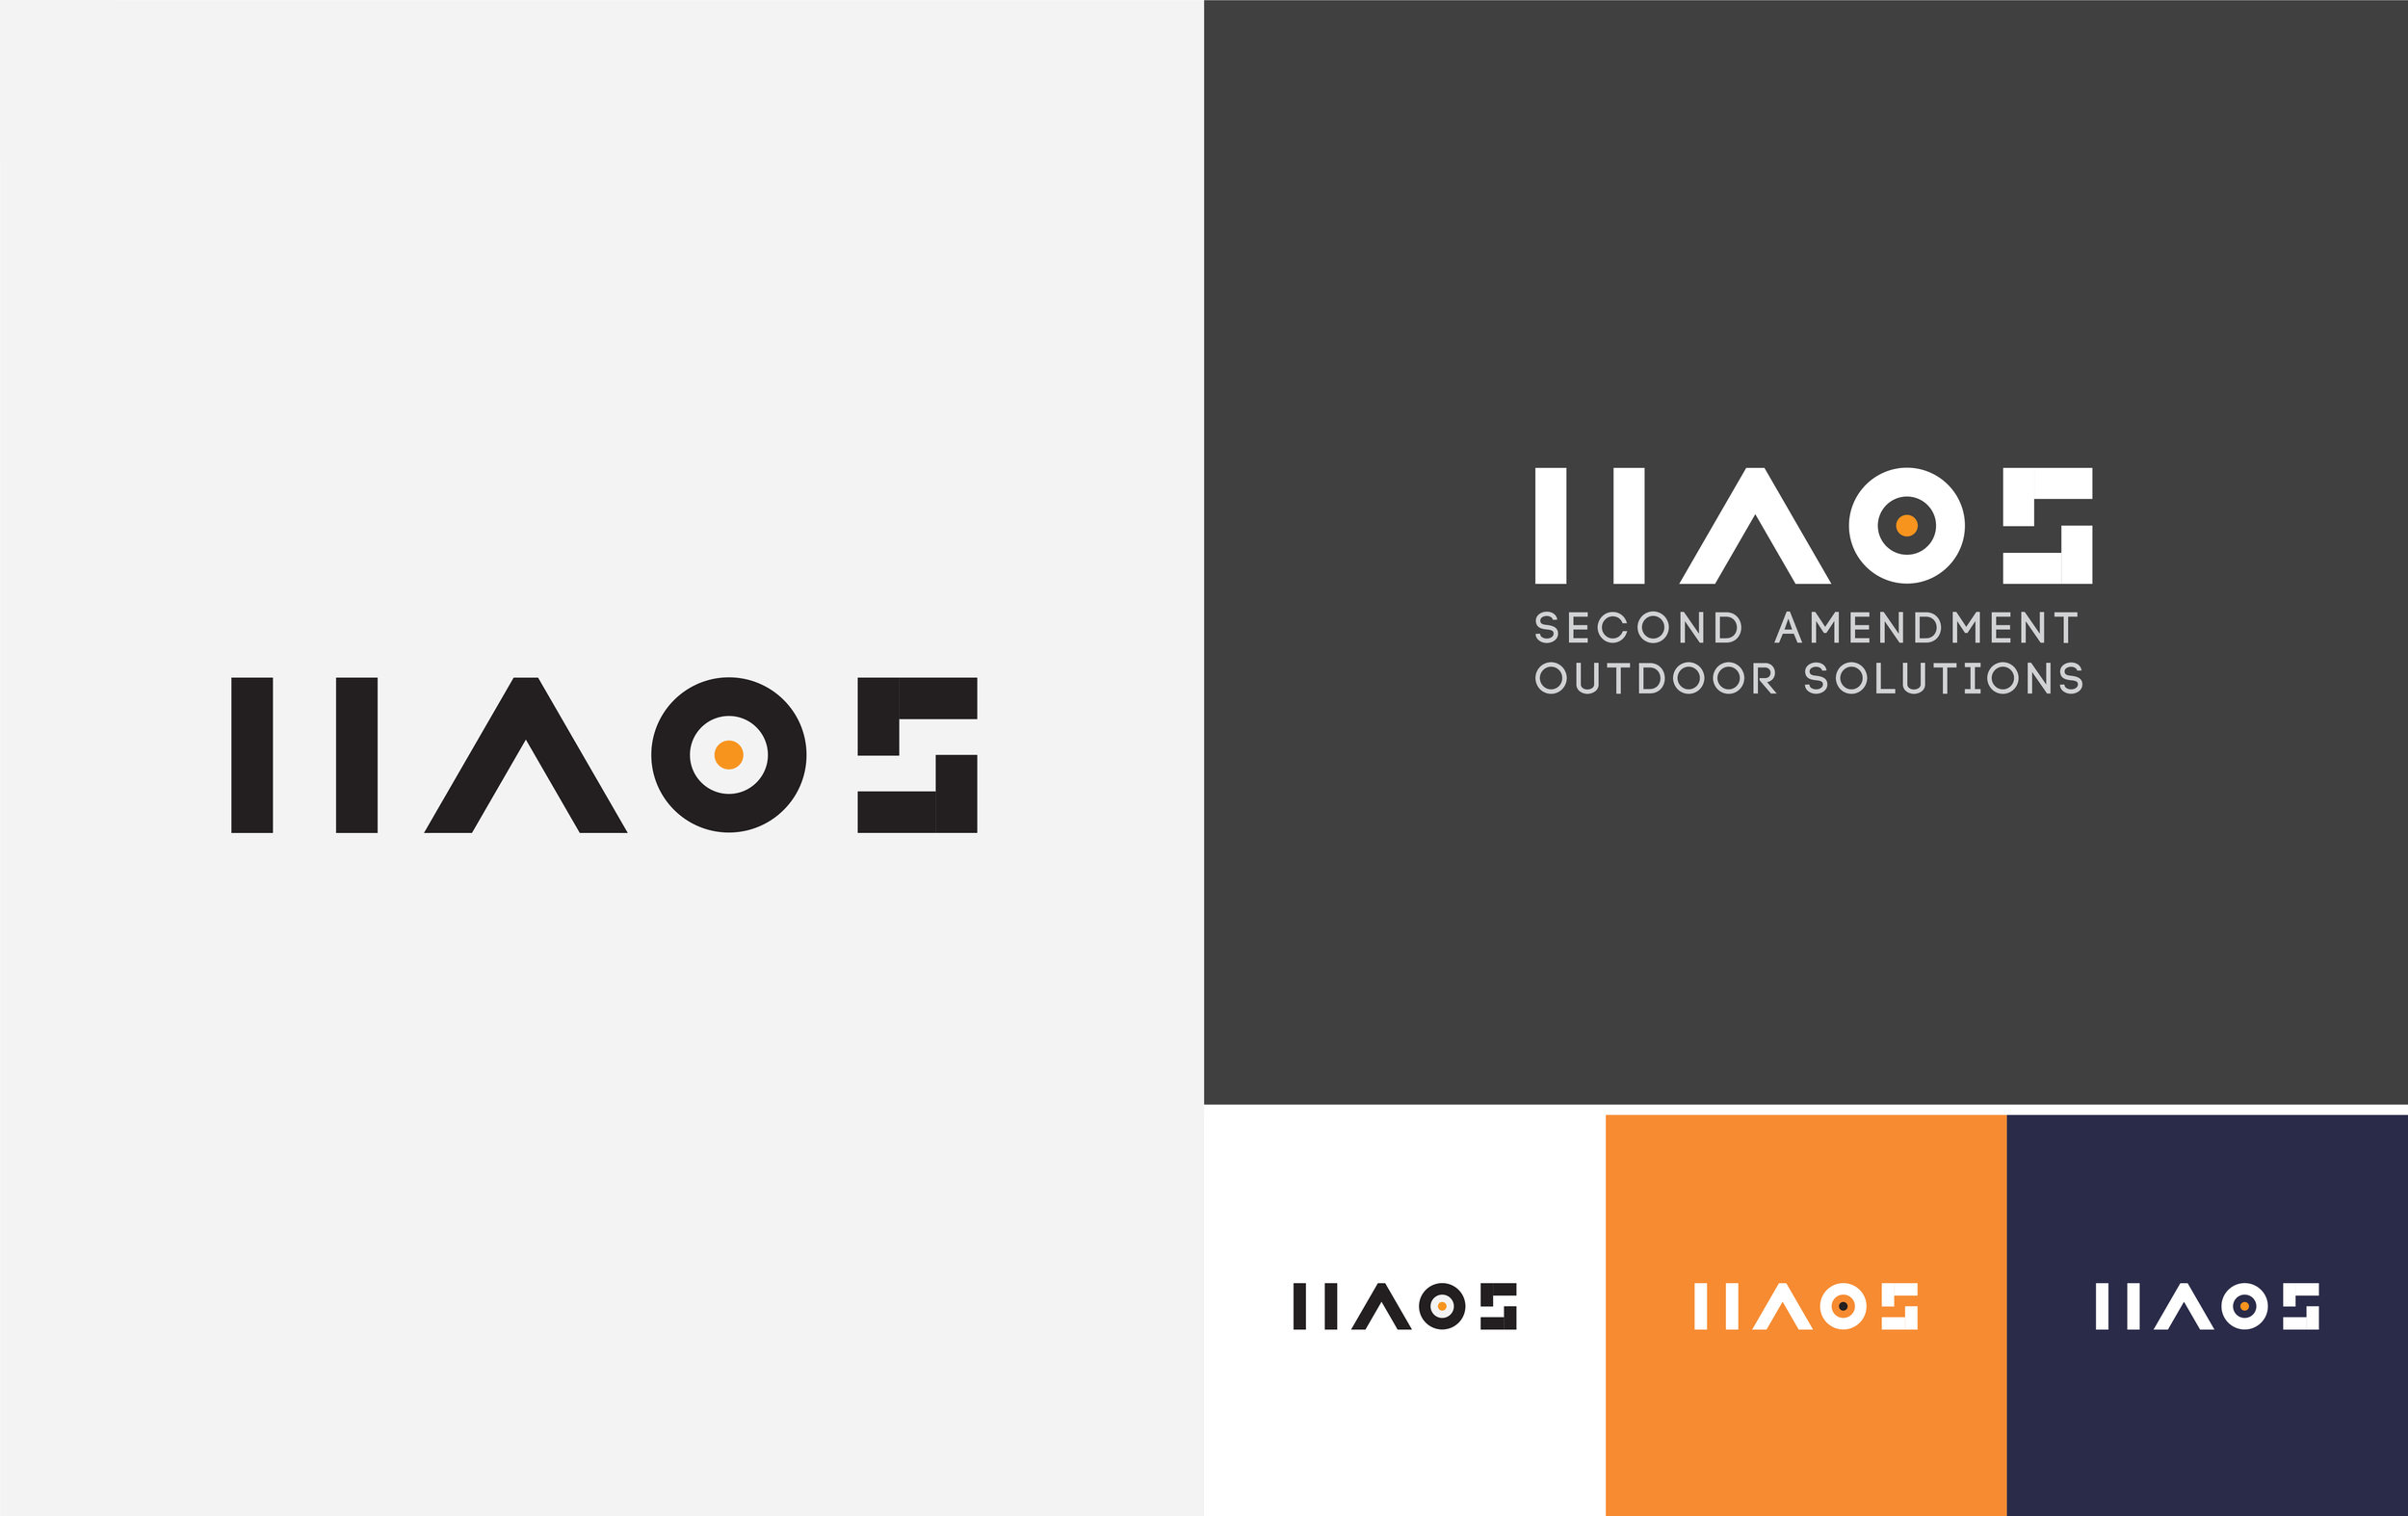 2AOS_R1_logos_working_v3_PRINT-7.jpg